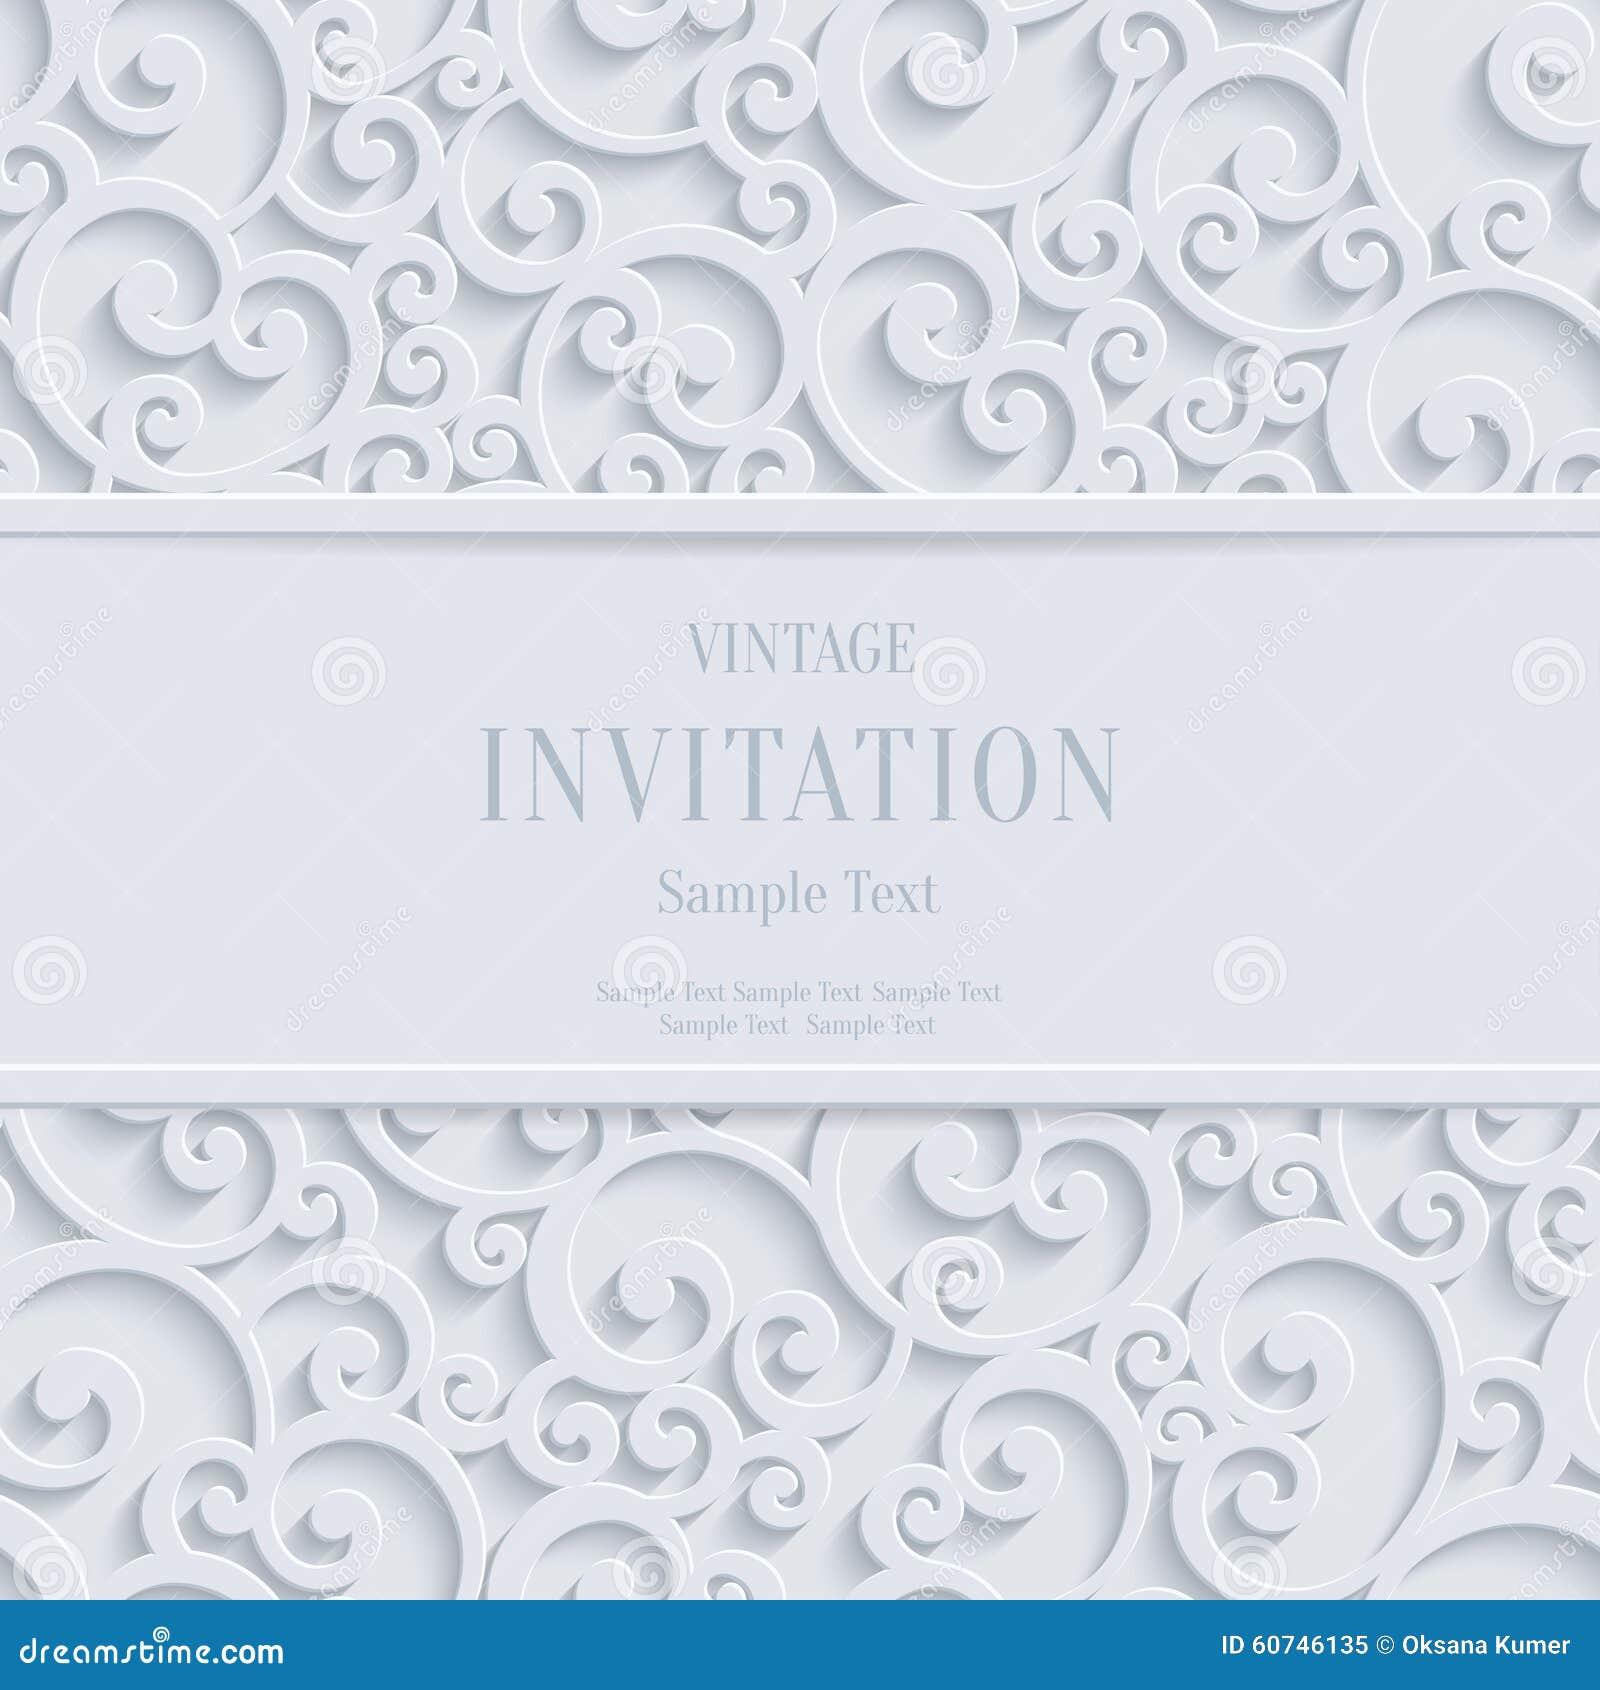 Vector white 3d vintage christmas or invitation cards background vector white 3d vintage christmas or invitation cards background with swirl damask pattern stopboris Choice Image